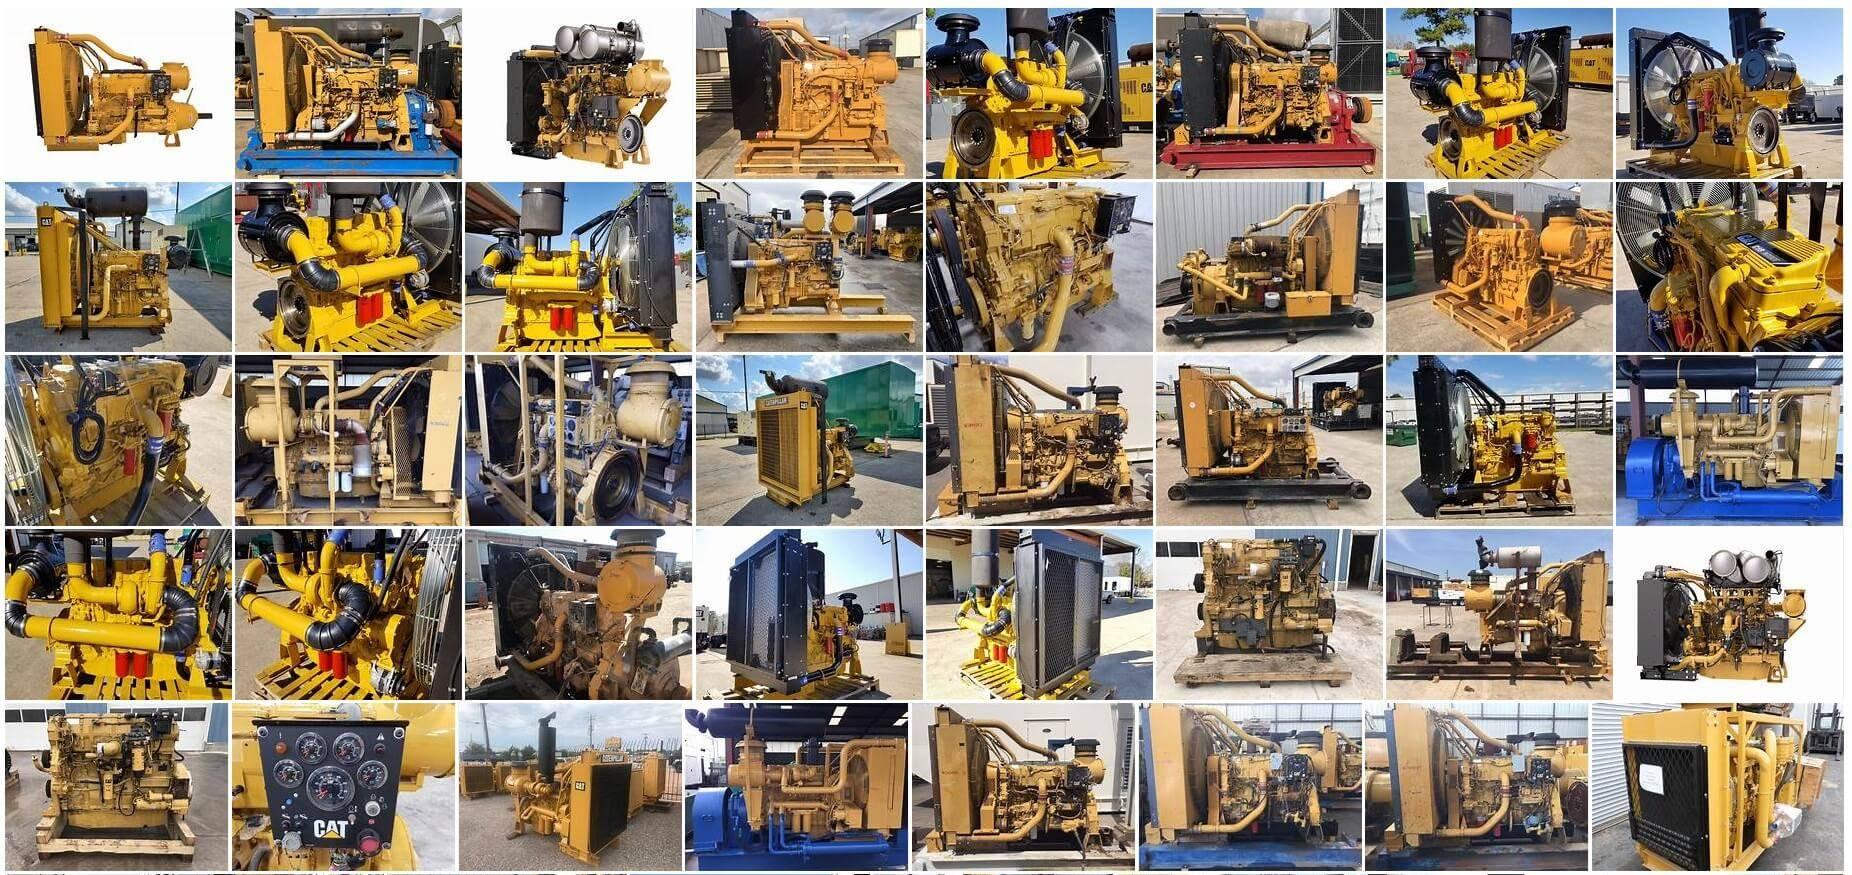 Caterpillar C18 Power Units For Sale